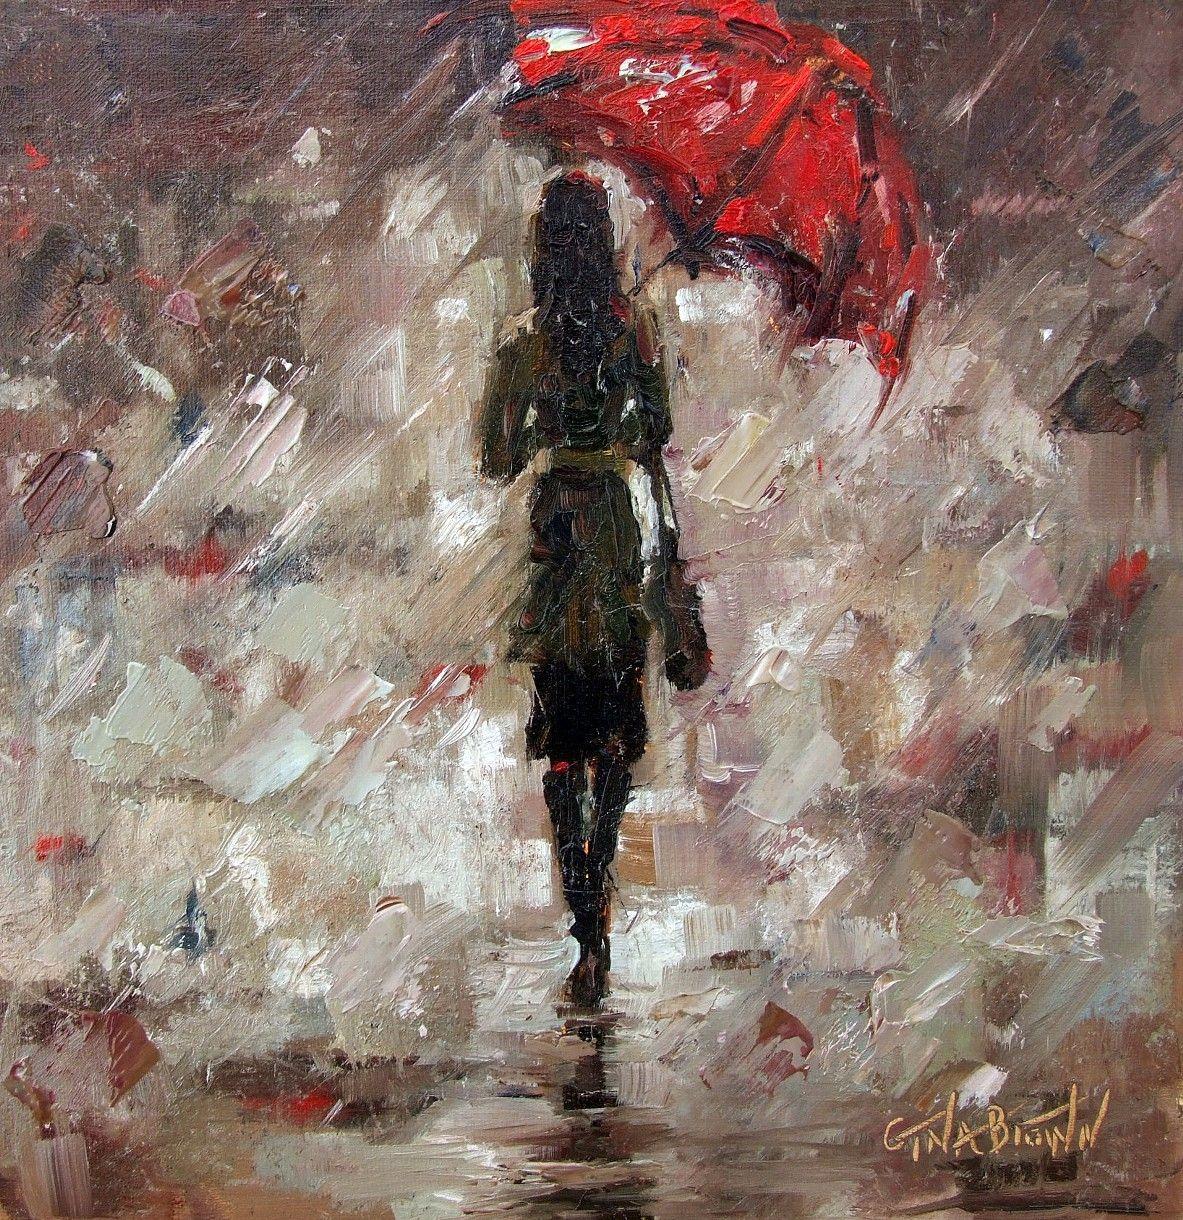 Wind and Rain Gina Brown